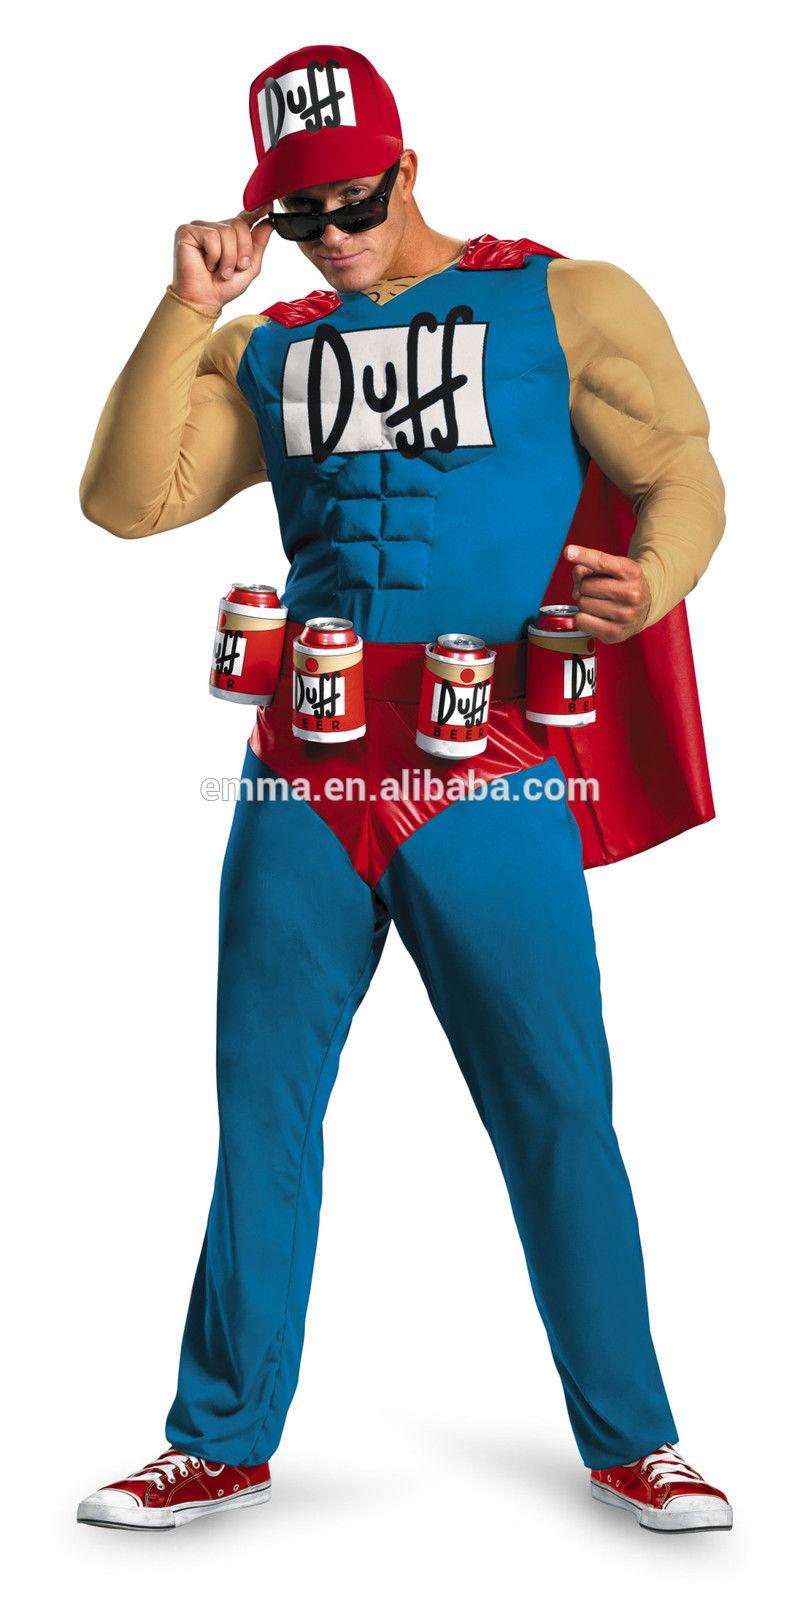 Mens adultos traje duffman muscular os simpsons duff man halloween xl coldre cerveja cm-1703 traje